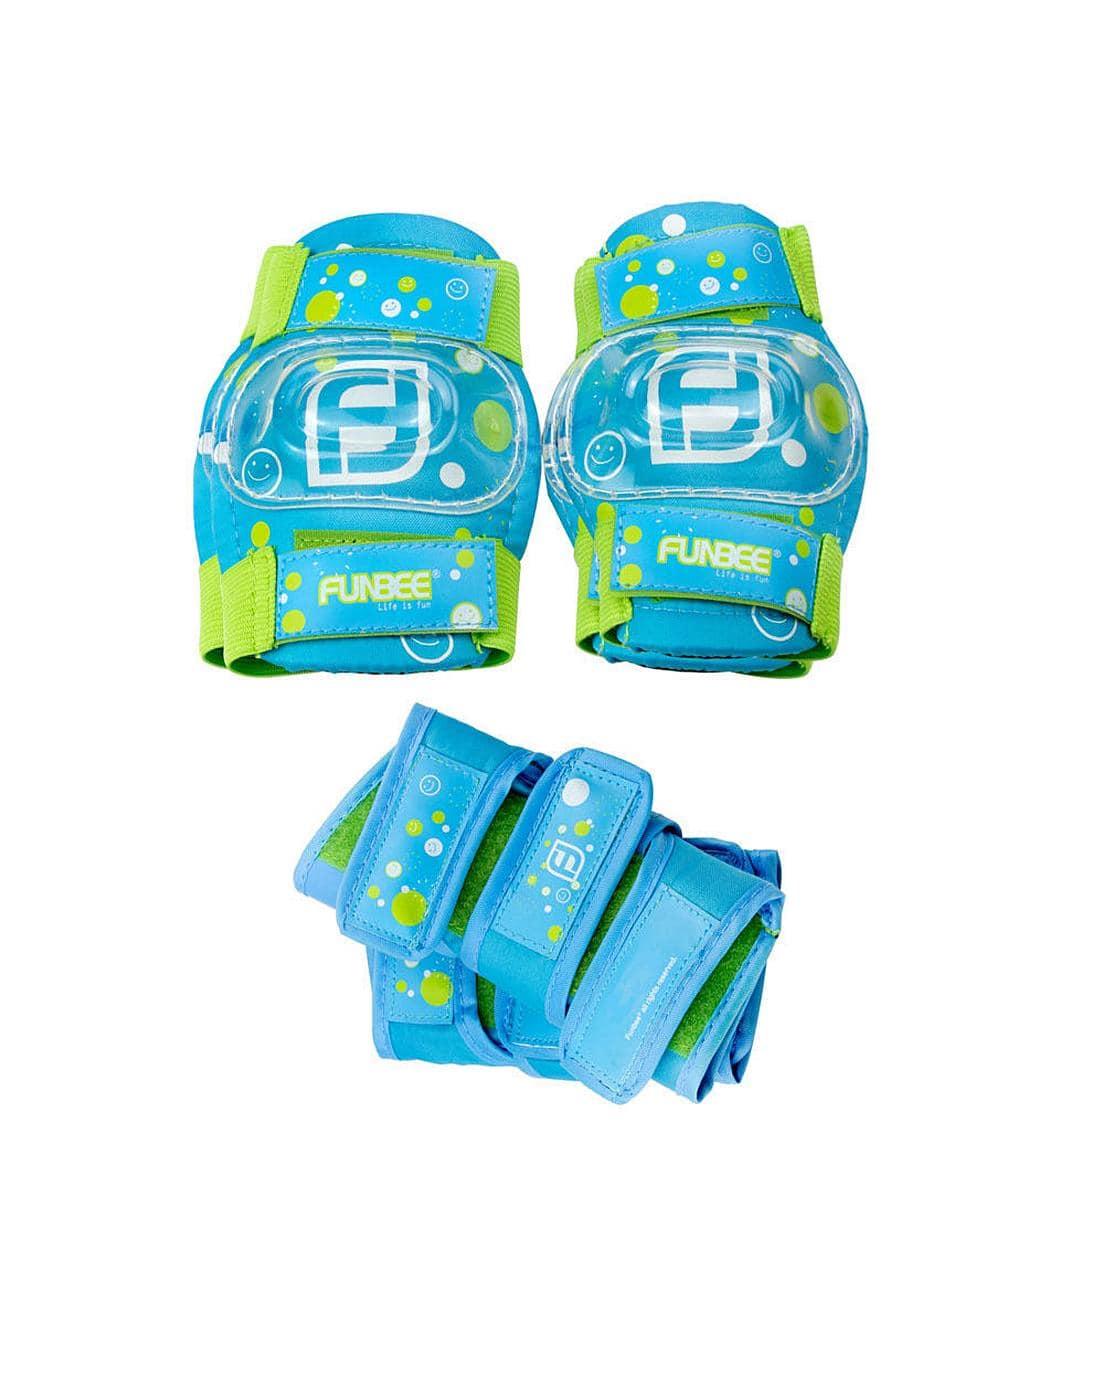 FUNBEE Kids Protection Set.